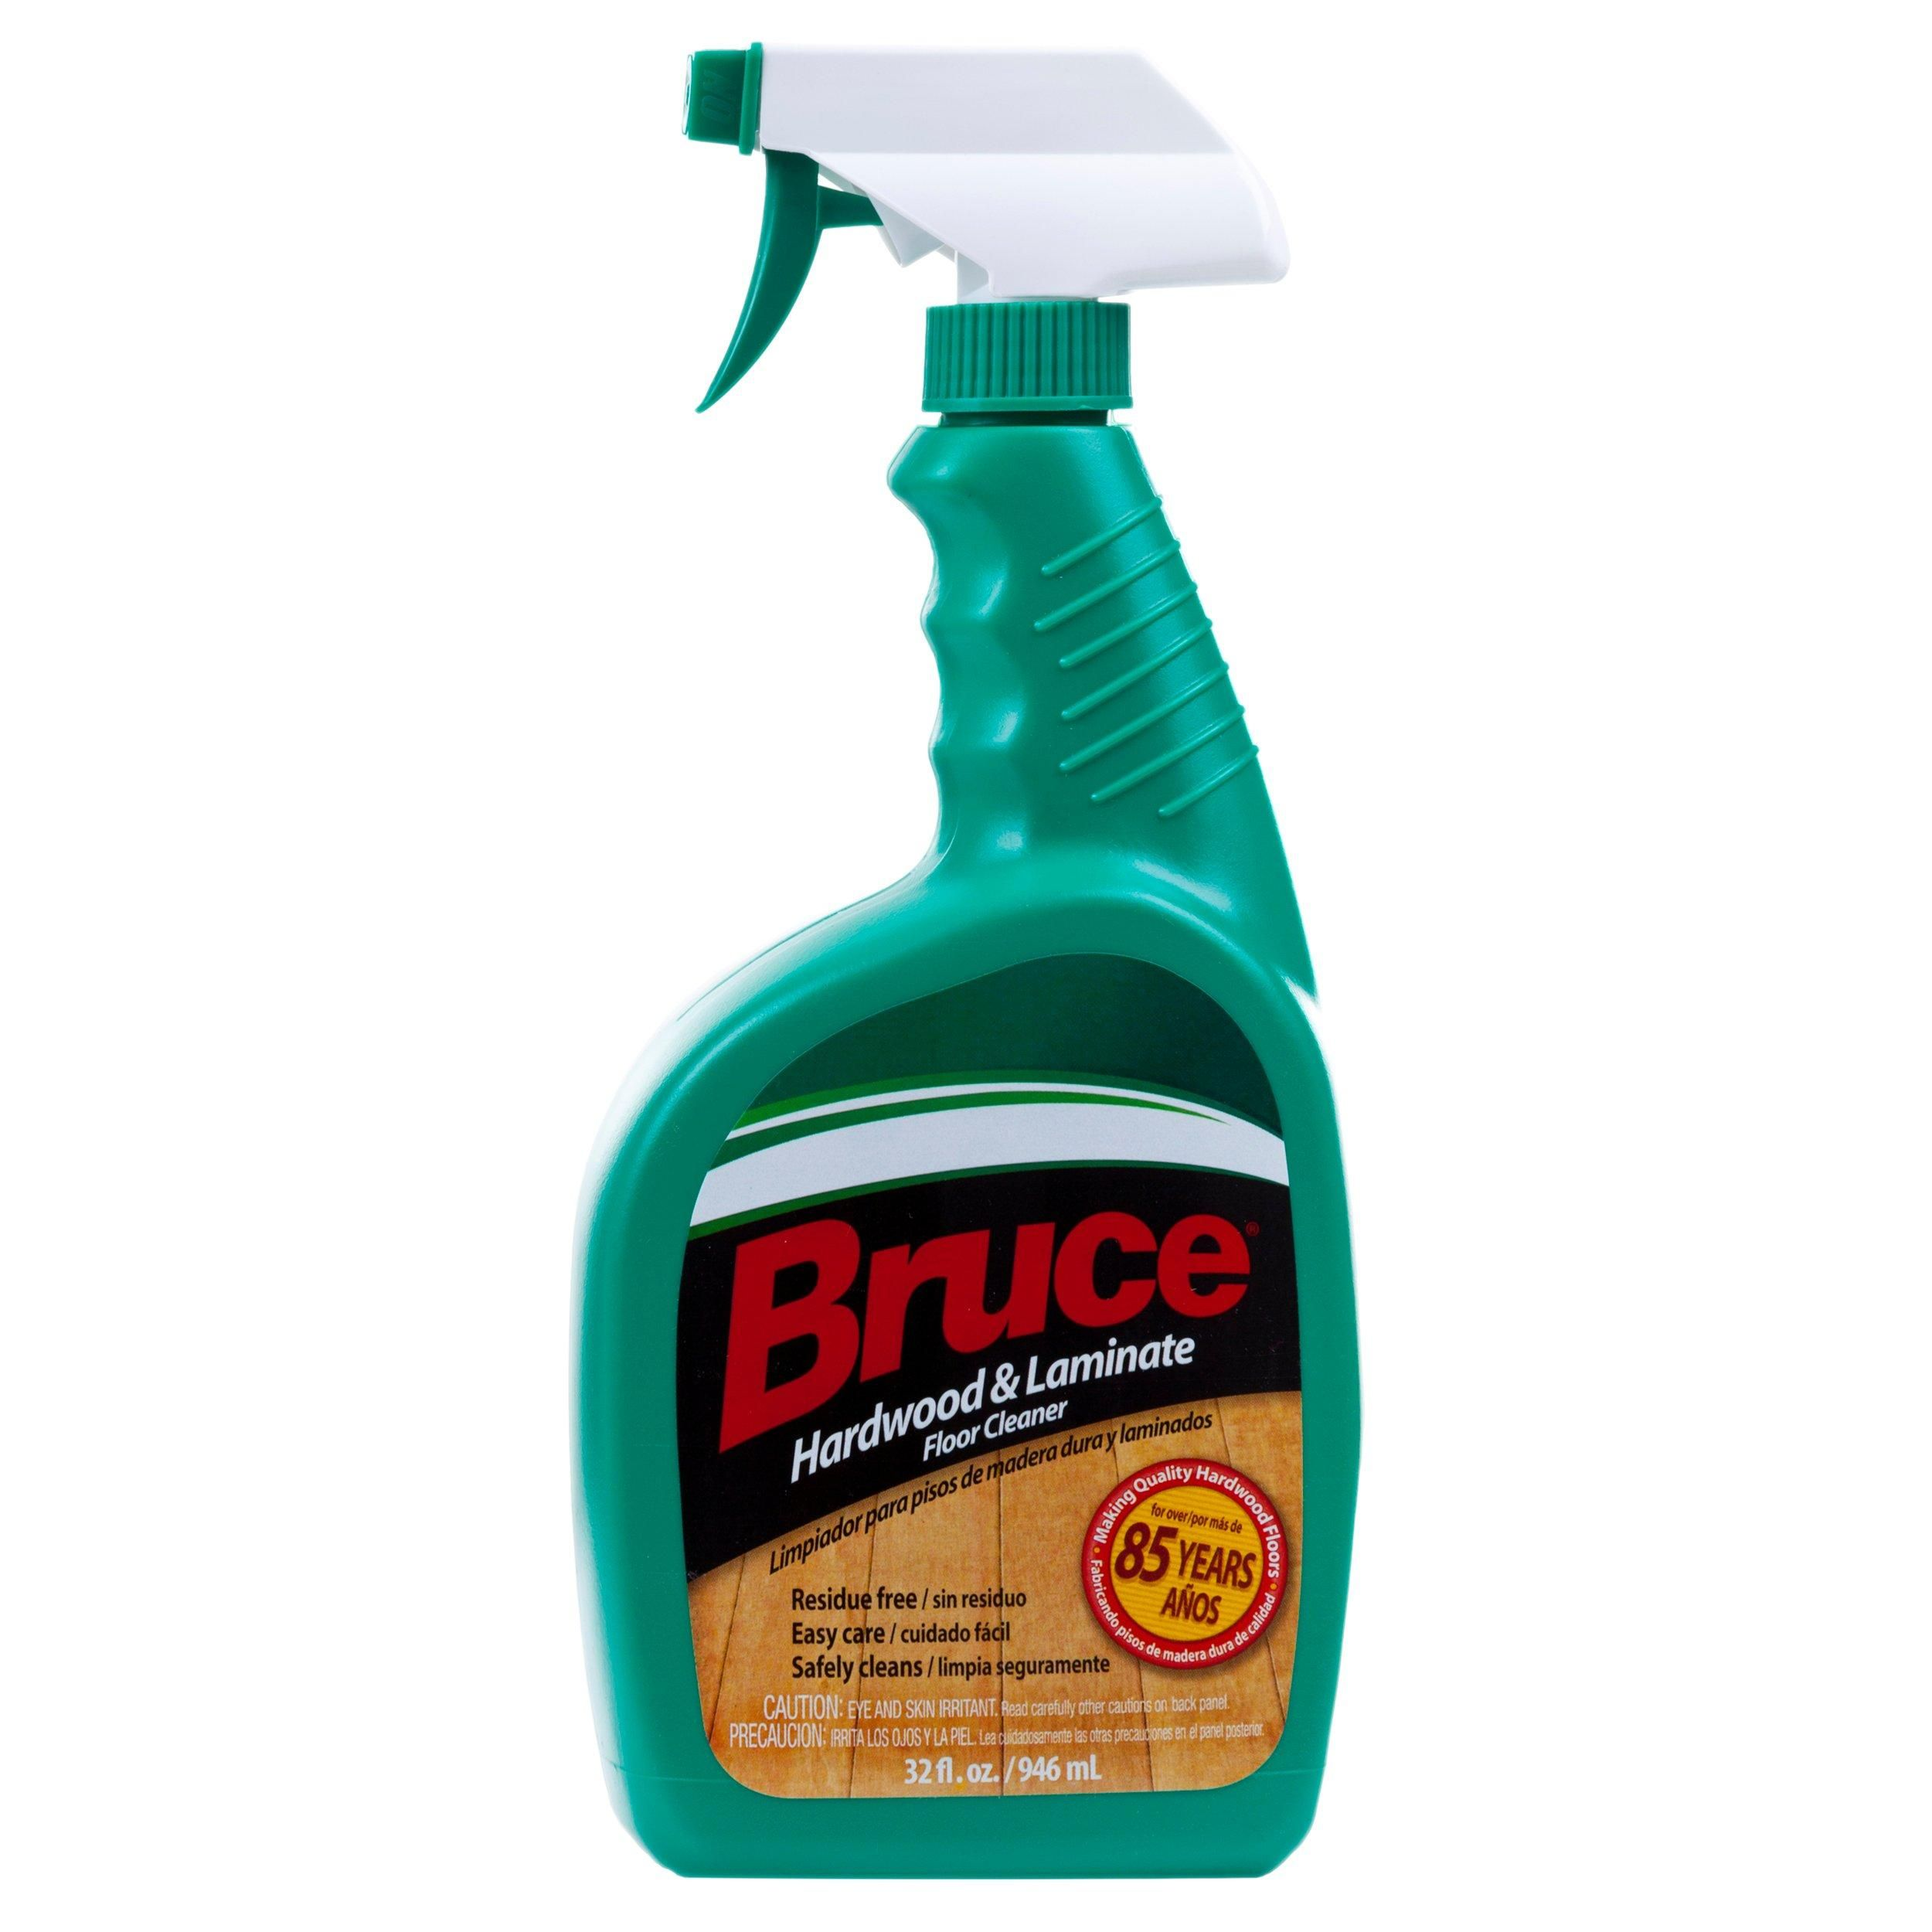 Bruce Hardwood and Laminate Cleaner Clean hardwood